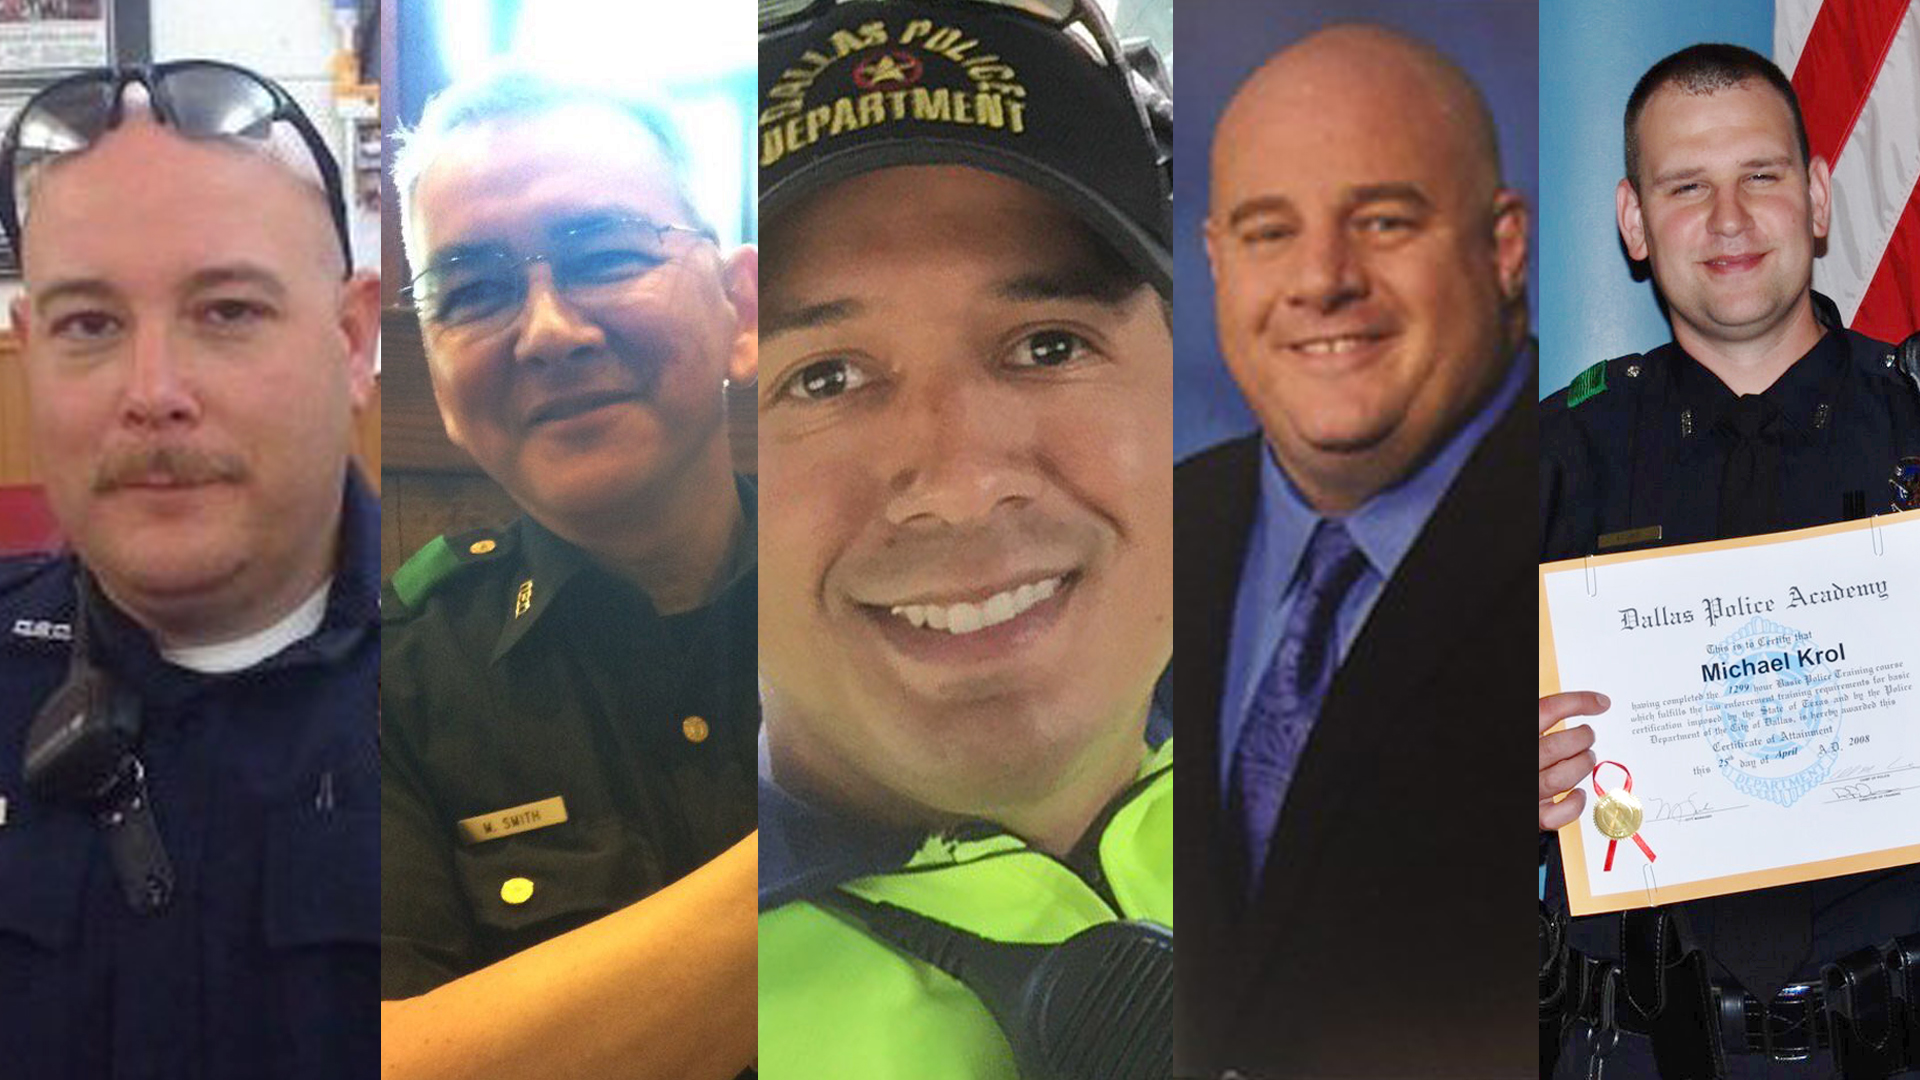 Remembering the slain police officers in Dallas